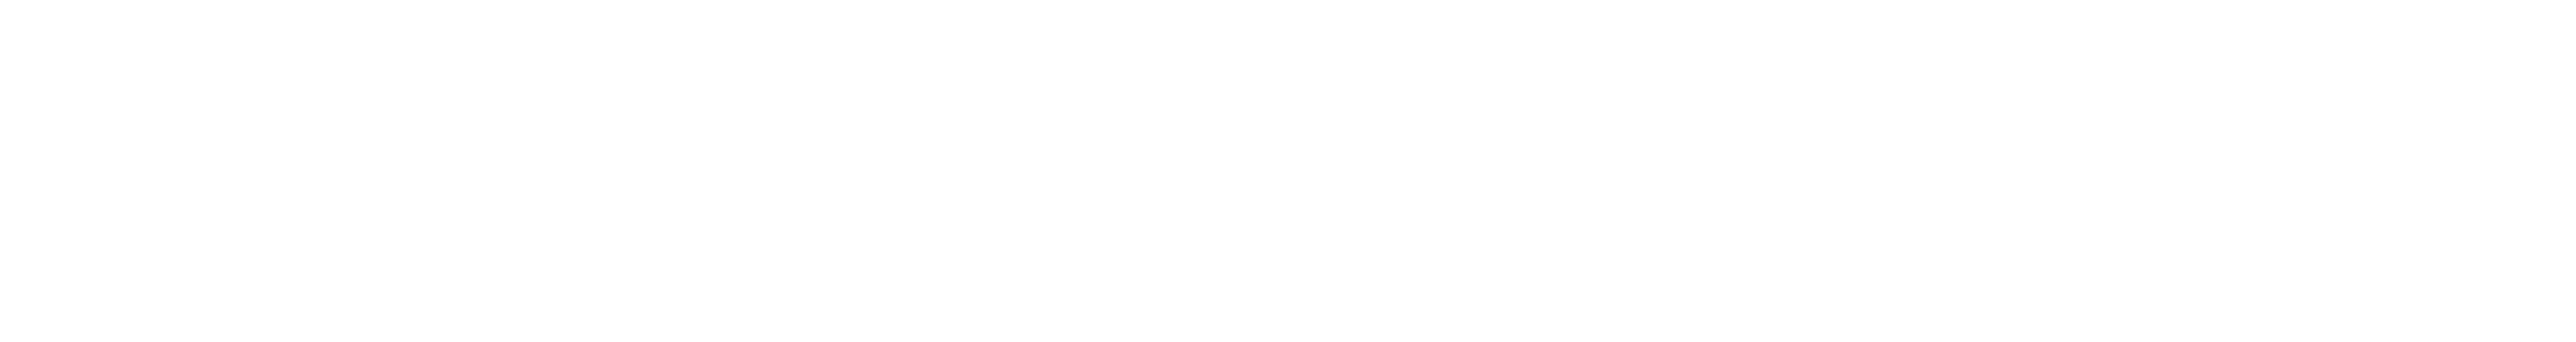 TrønderSport